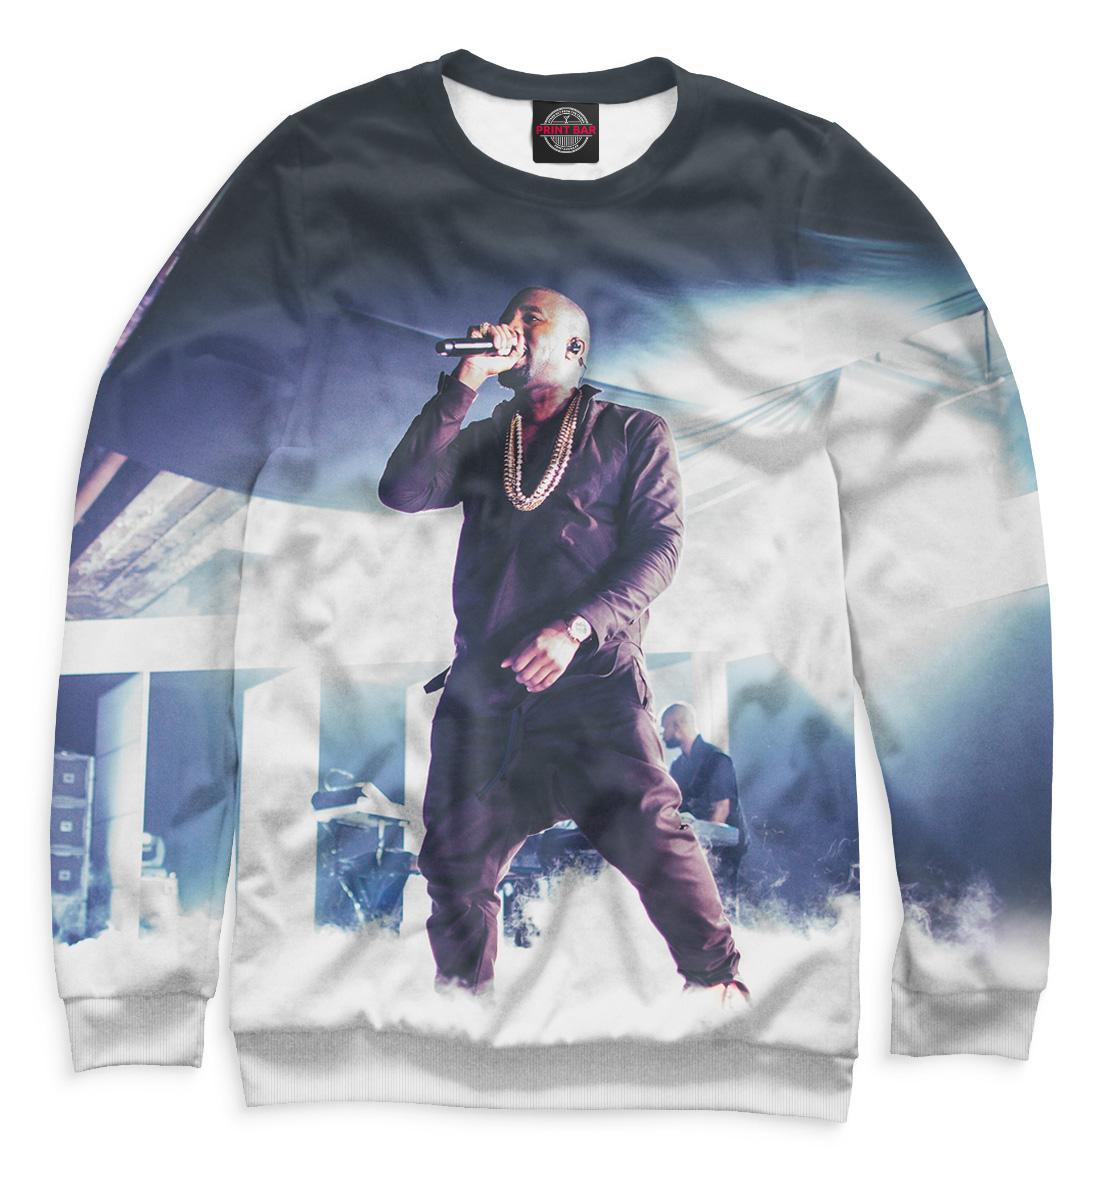 Купить Kanye West, Printbar, Свитшоты, KAW-246601-swi-2